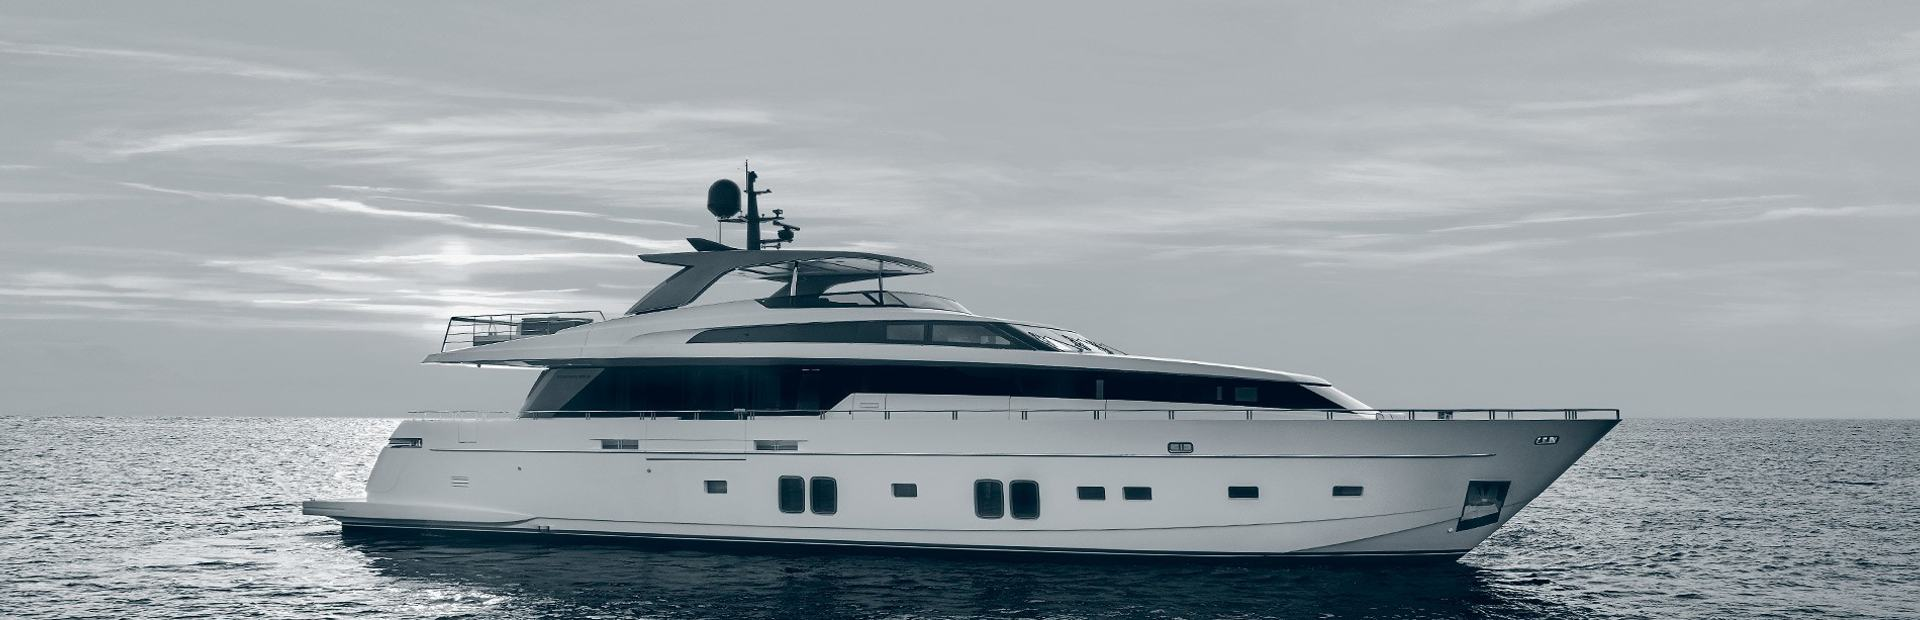 SL106 Yacht Charter